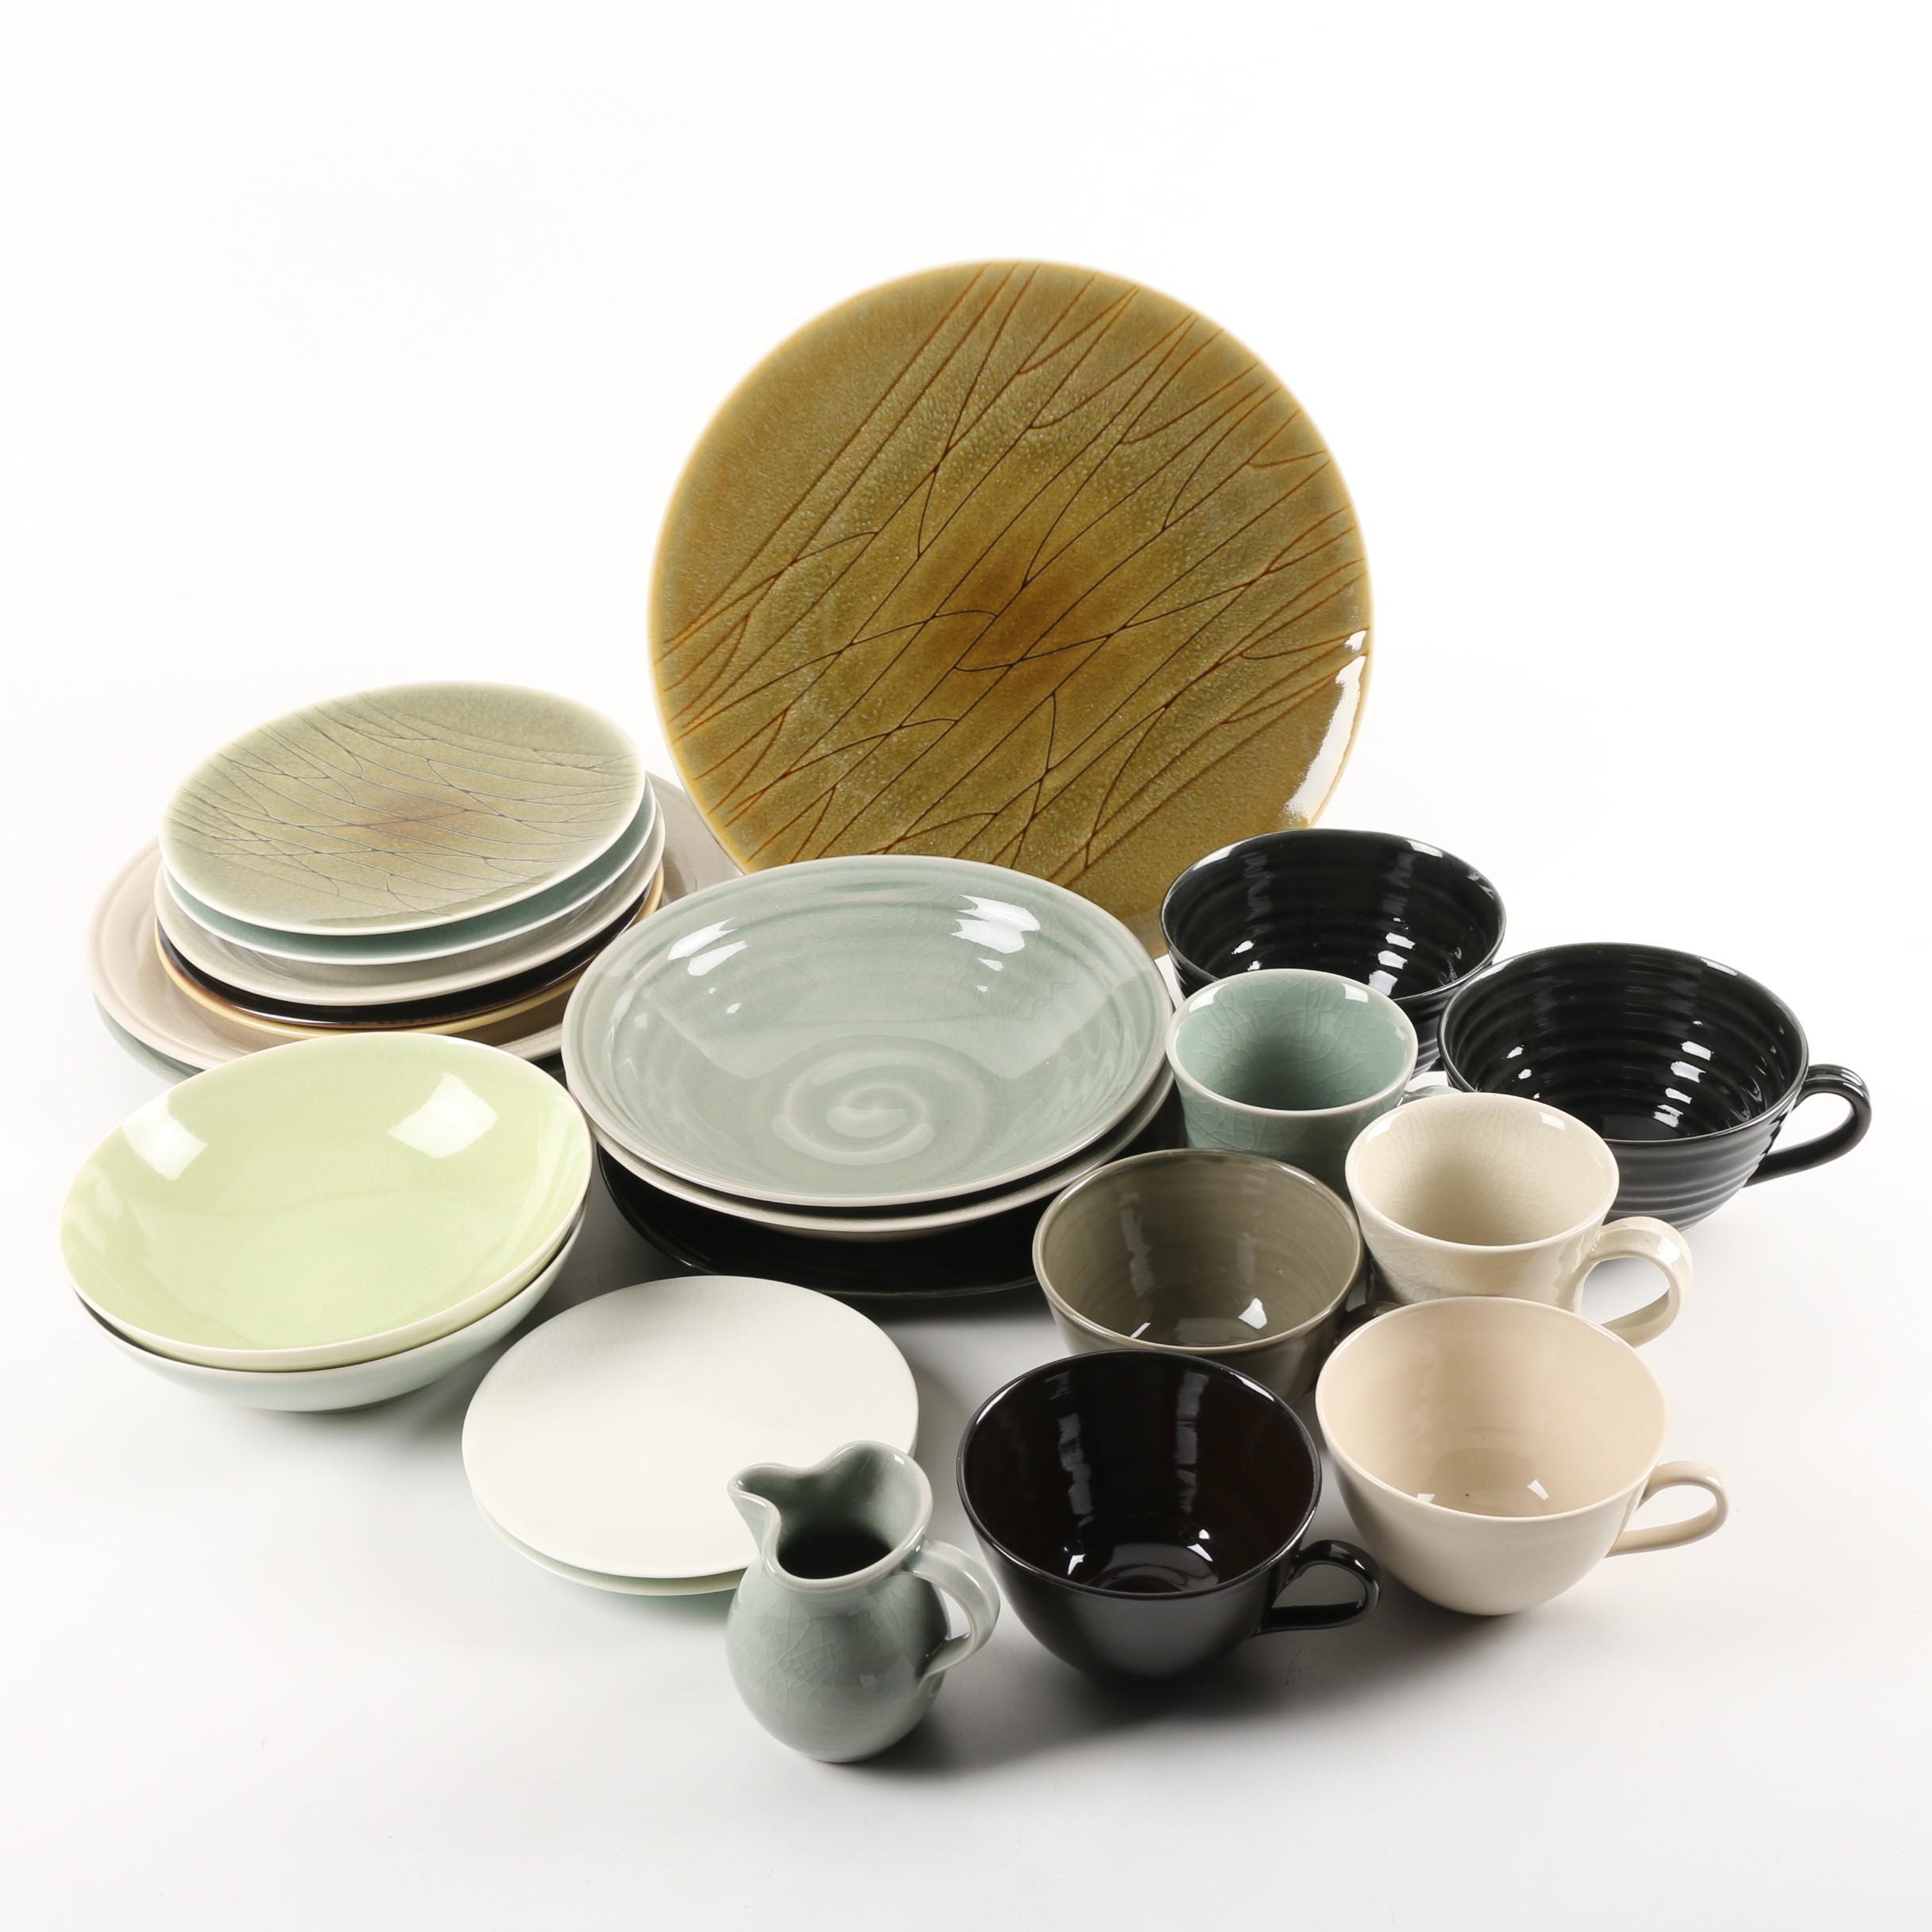 Handmade Stoneware and Porcelain Tableware Including Simon Pearce